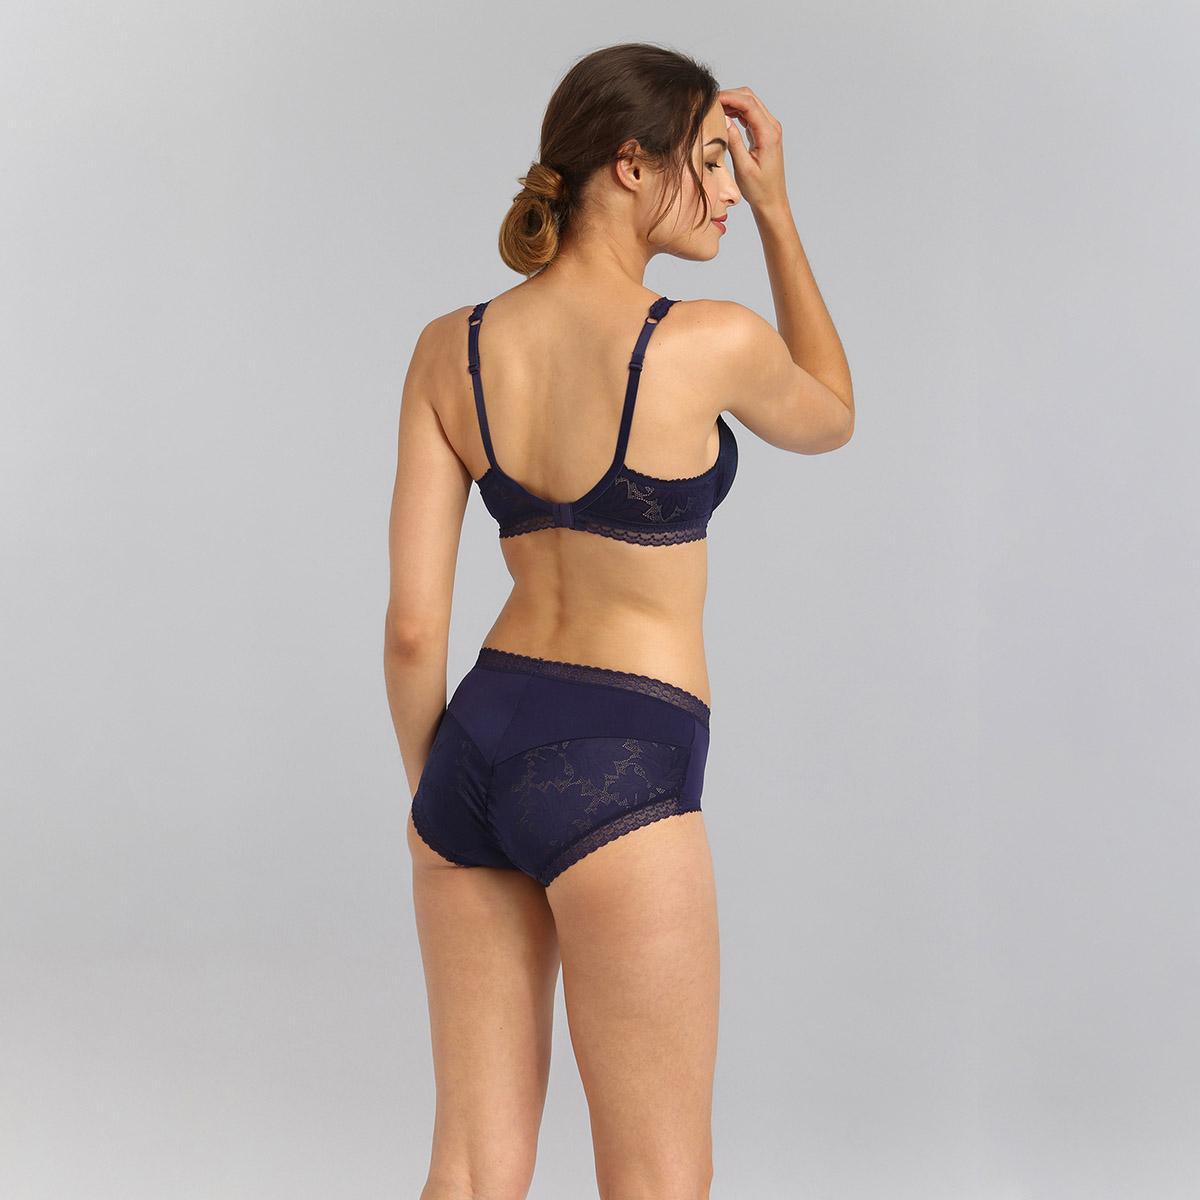 Balcony bra in navy blue Invisible Elegance, , PLAYTEX